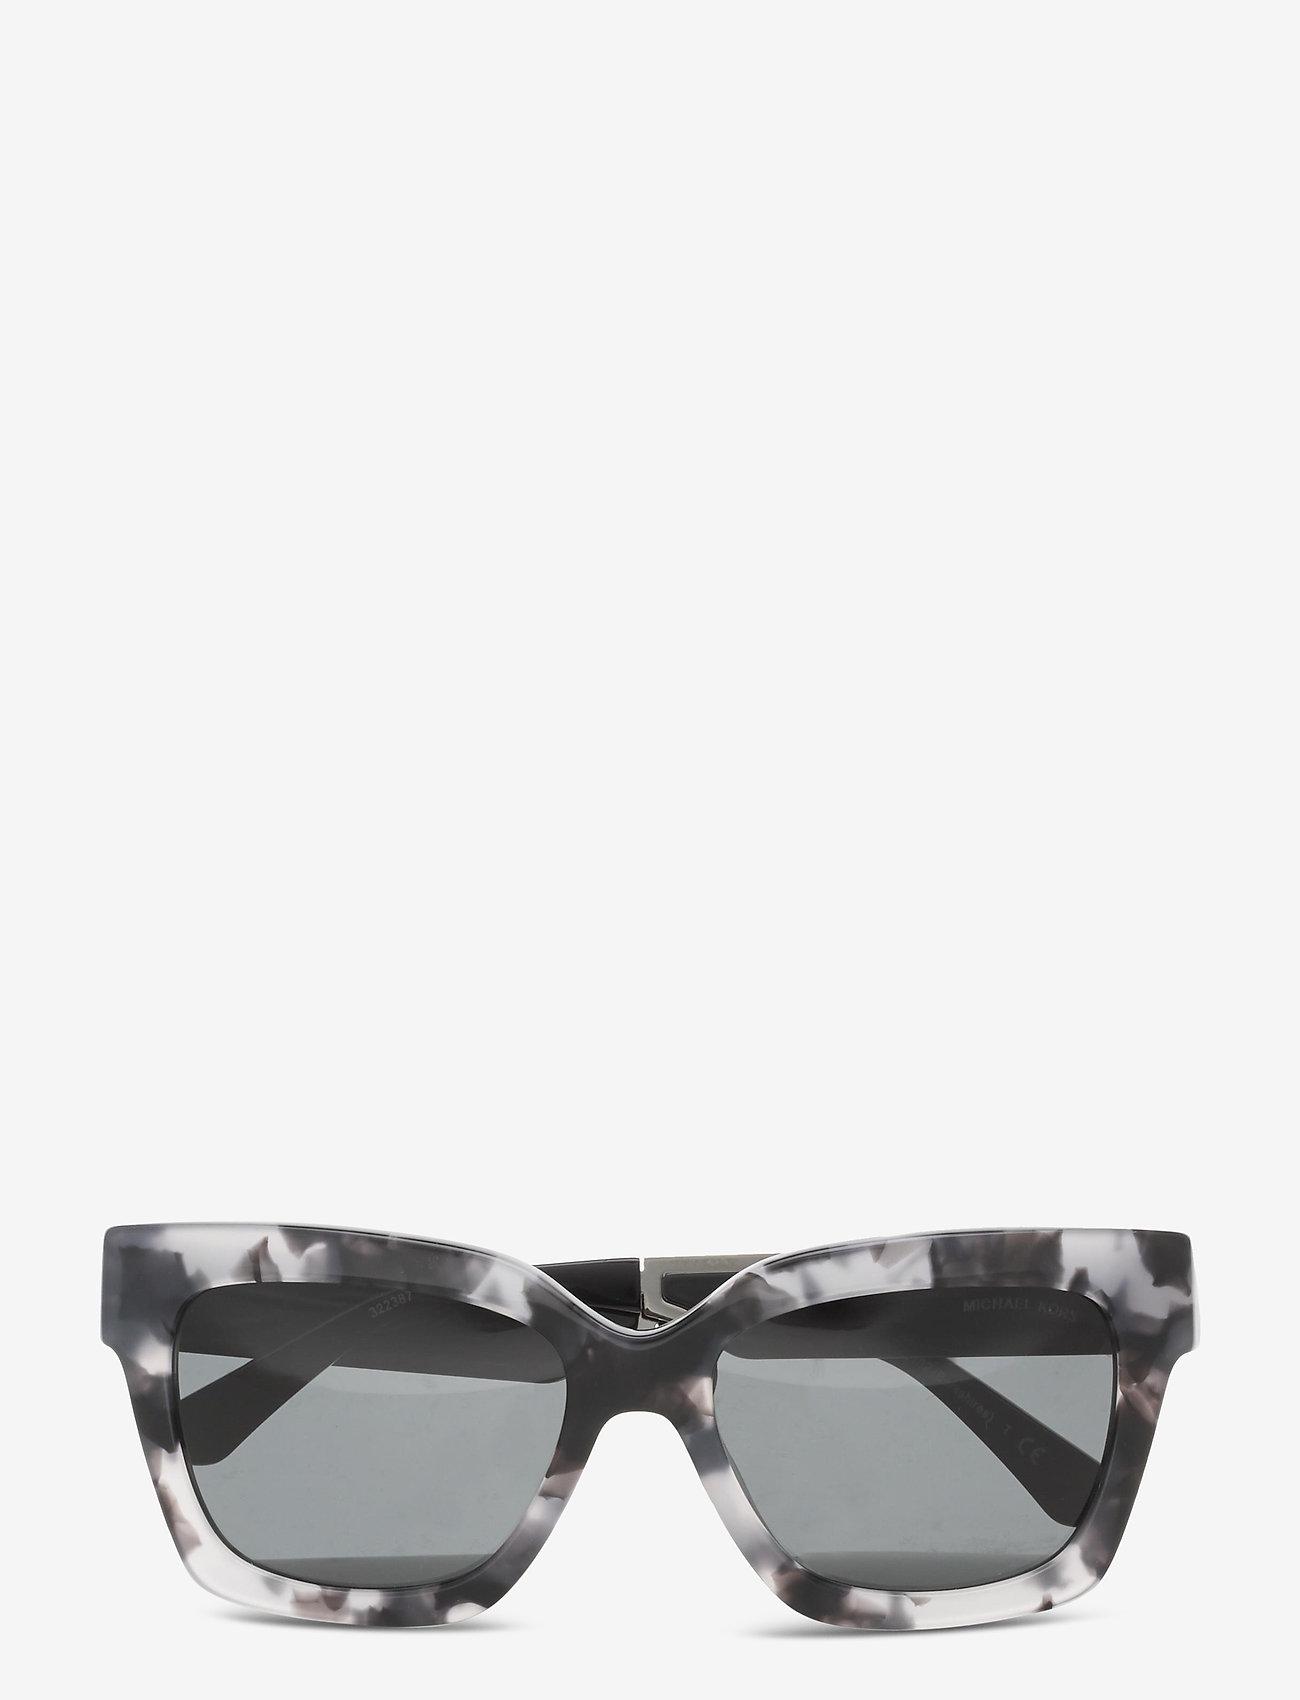 Michael Kors Sunglasses - Michael Kors Sunglasses - wayfarer - dark grey solid - 0